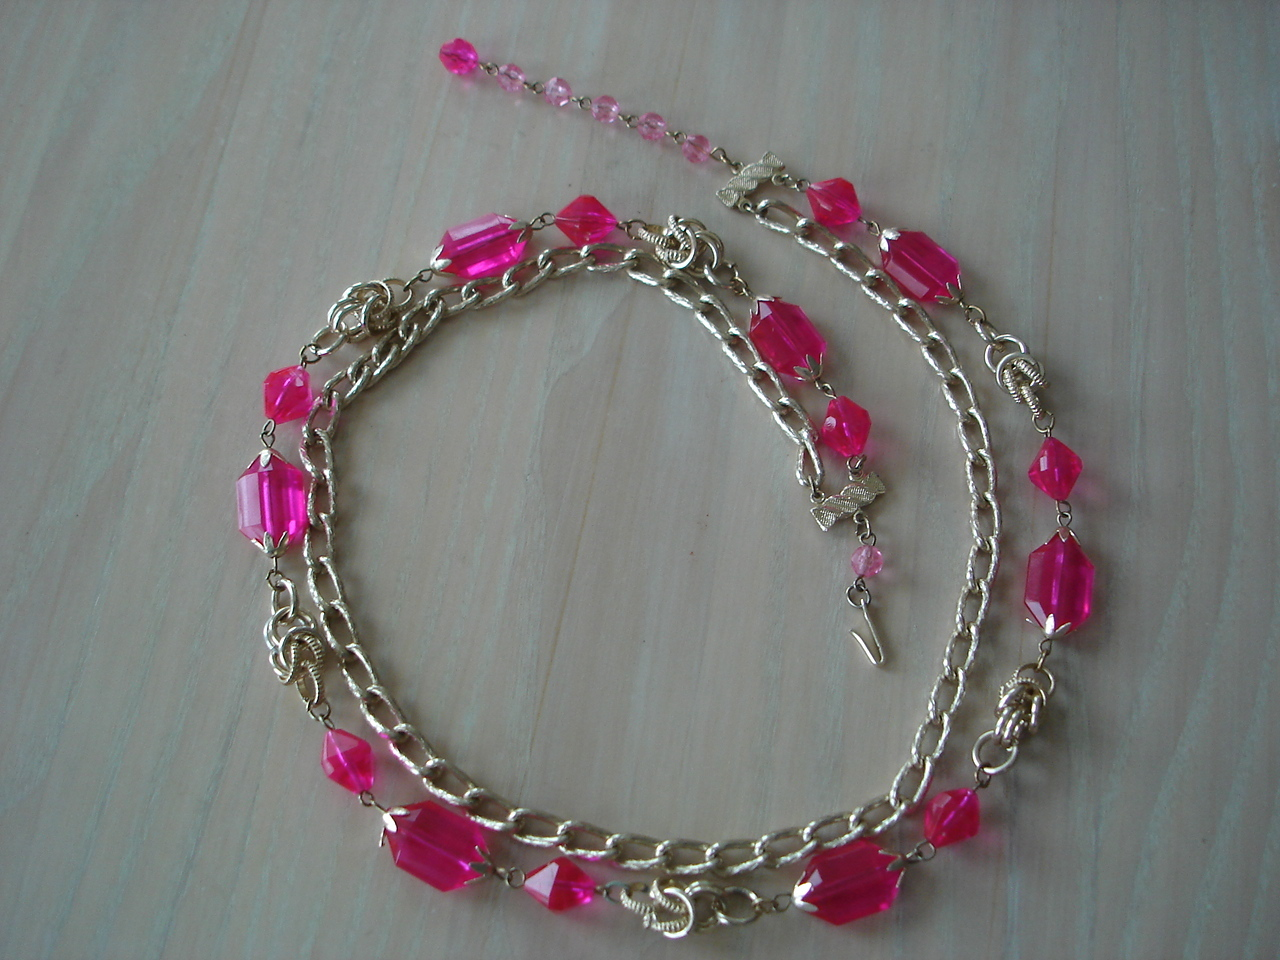 Goldtone & Hot Pink Acrylic Bead 2 Strand Necklace, Hong Kon